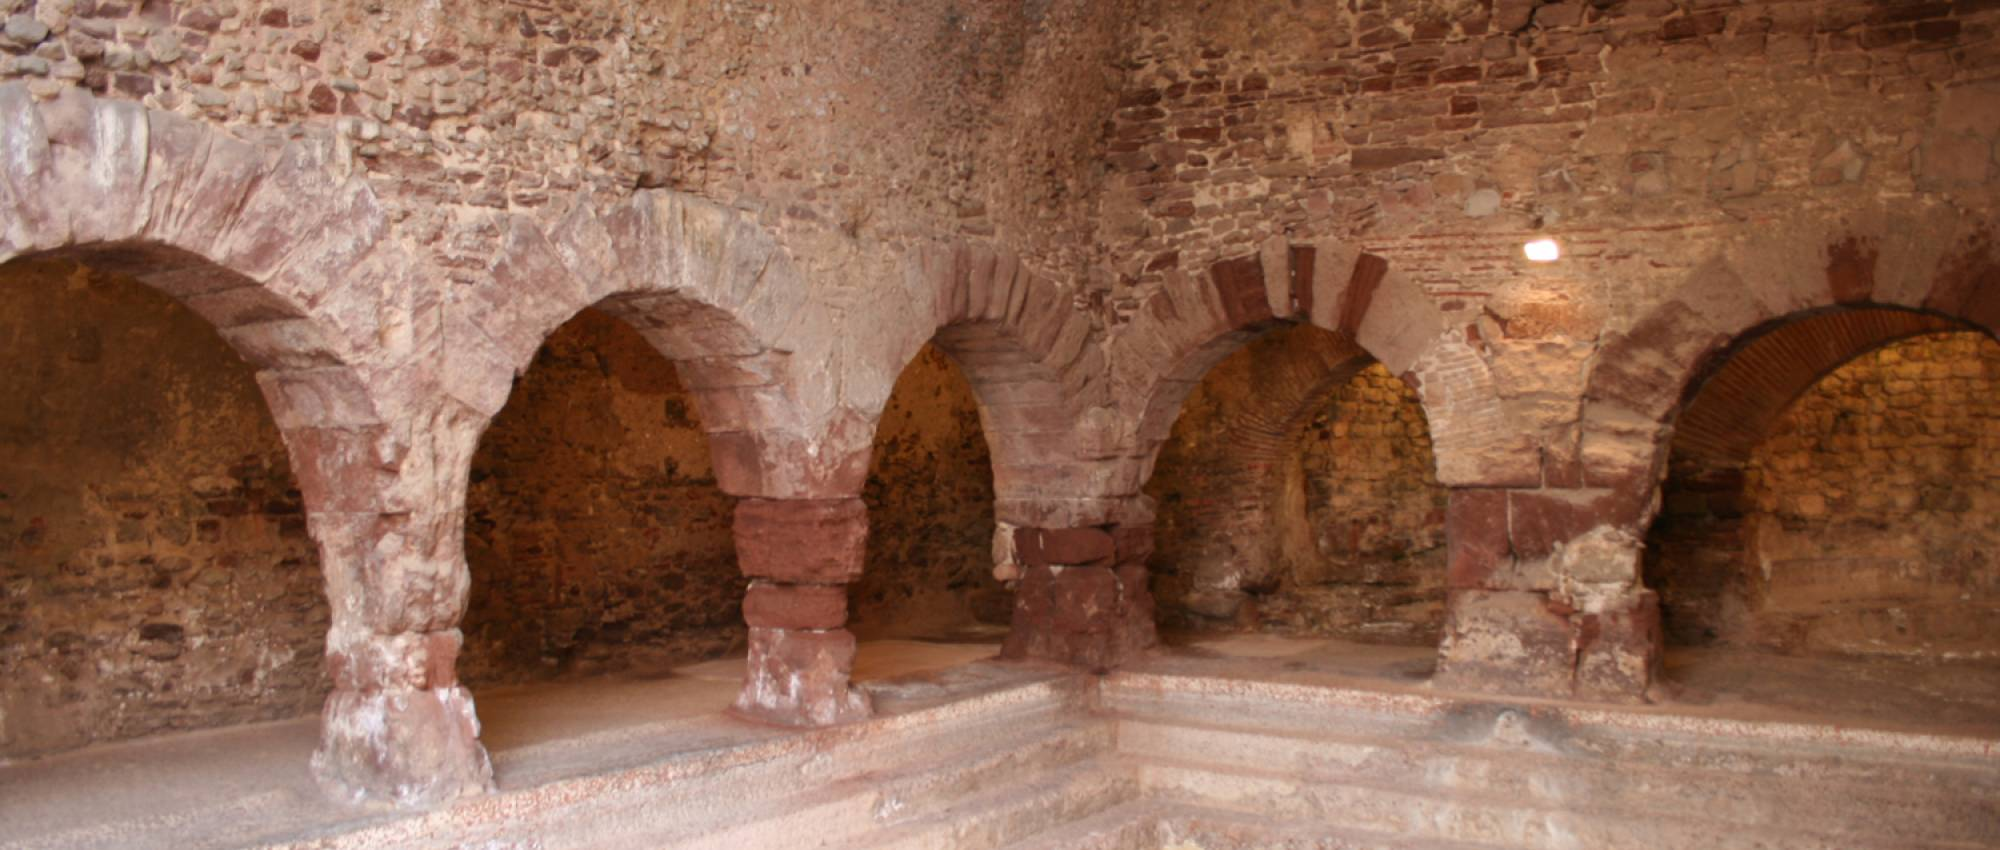 Termas romanas de Caldes de Montbui. CC BY-SA 3.0 - Wikimedia Commons